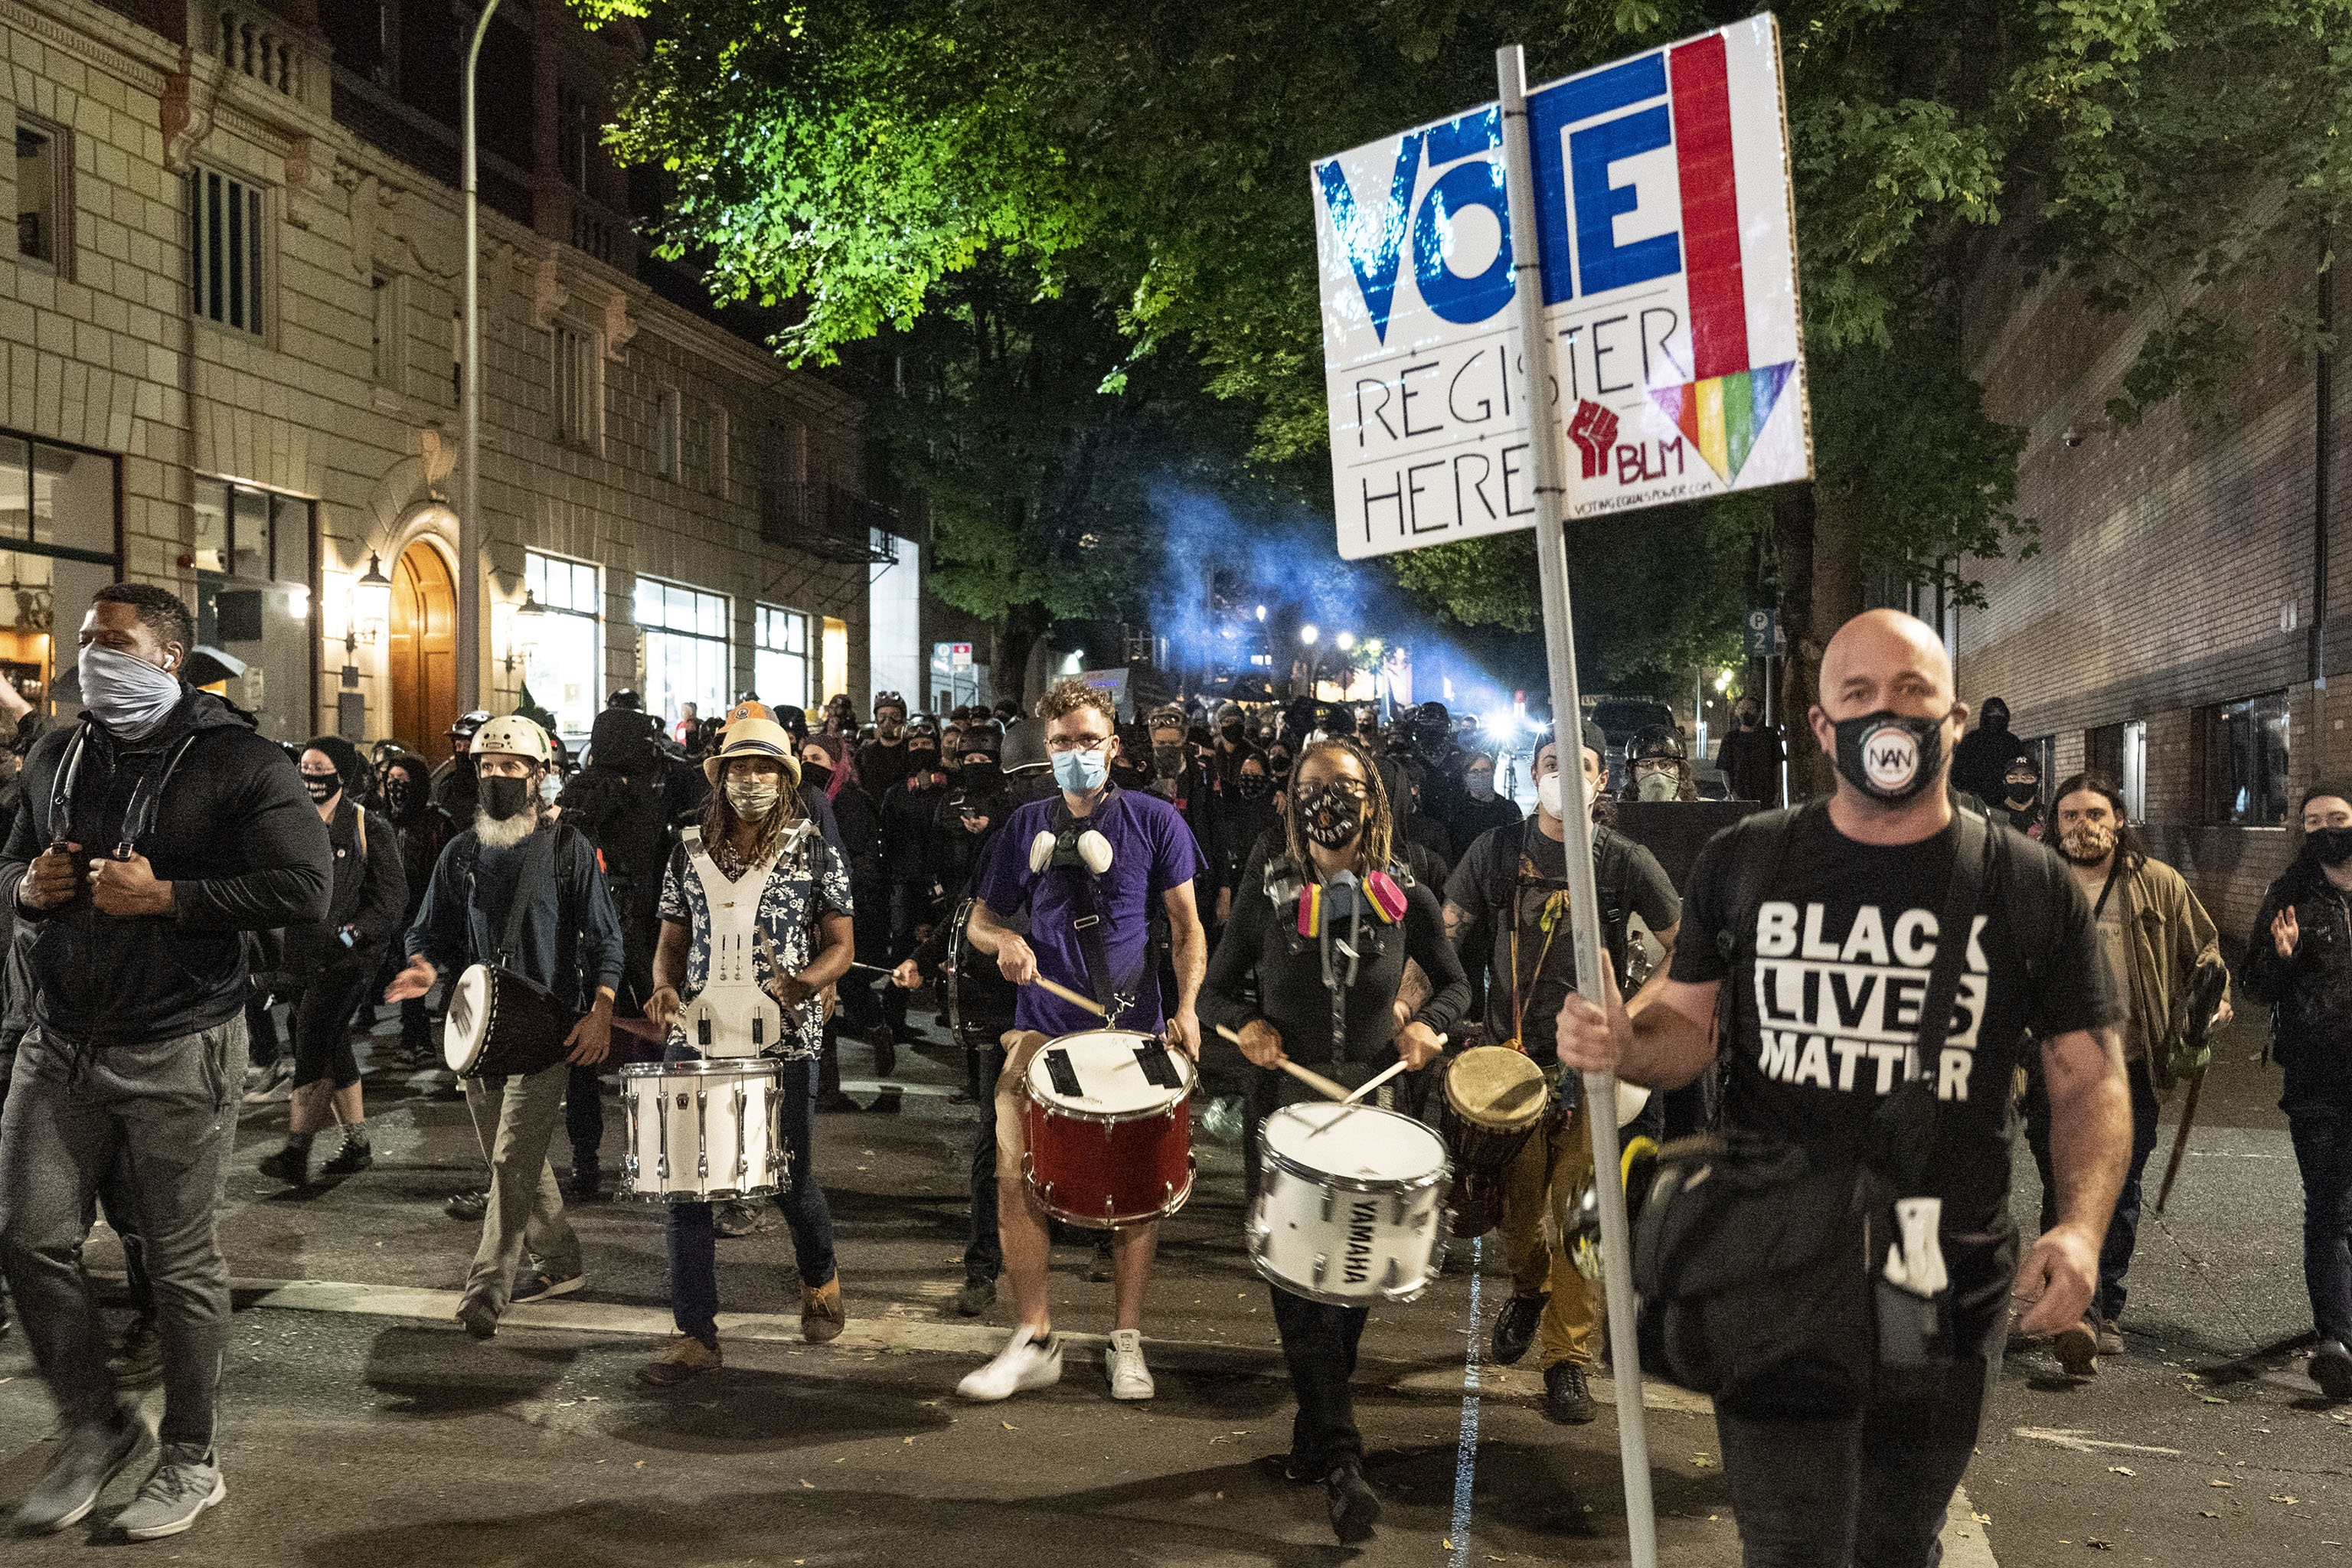 Black Lives Matter protesters in Portland.